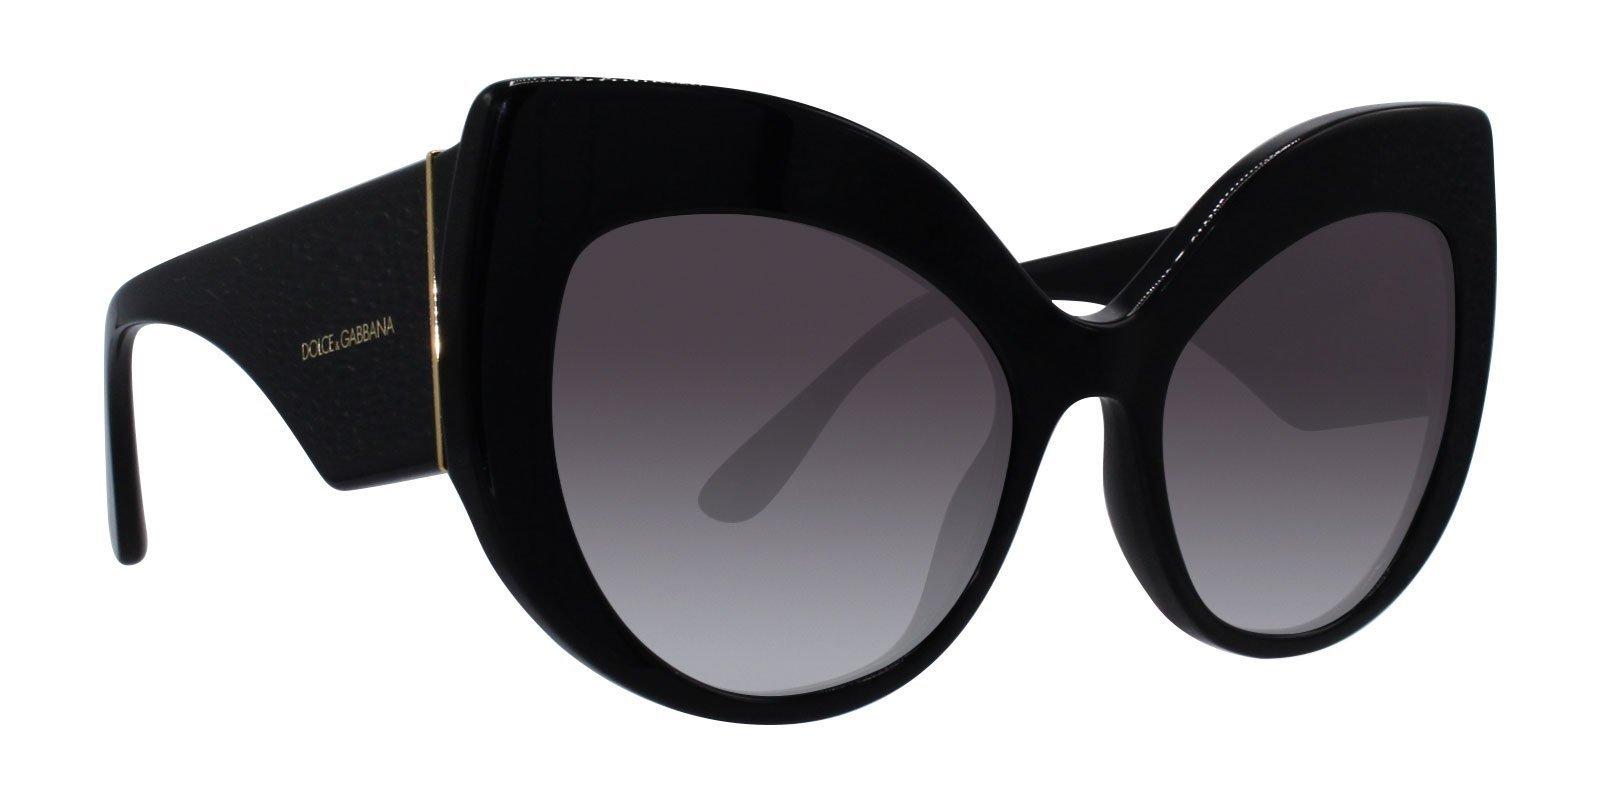 6e4adf062f7d dolce-gabbana-sunglasses-dolce-gabbana-dg4321-black-gray-designer ...